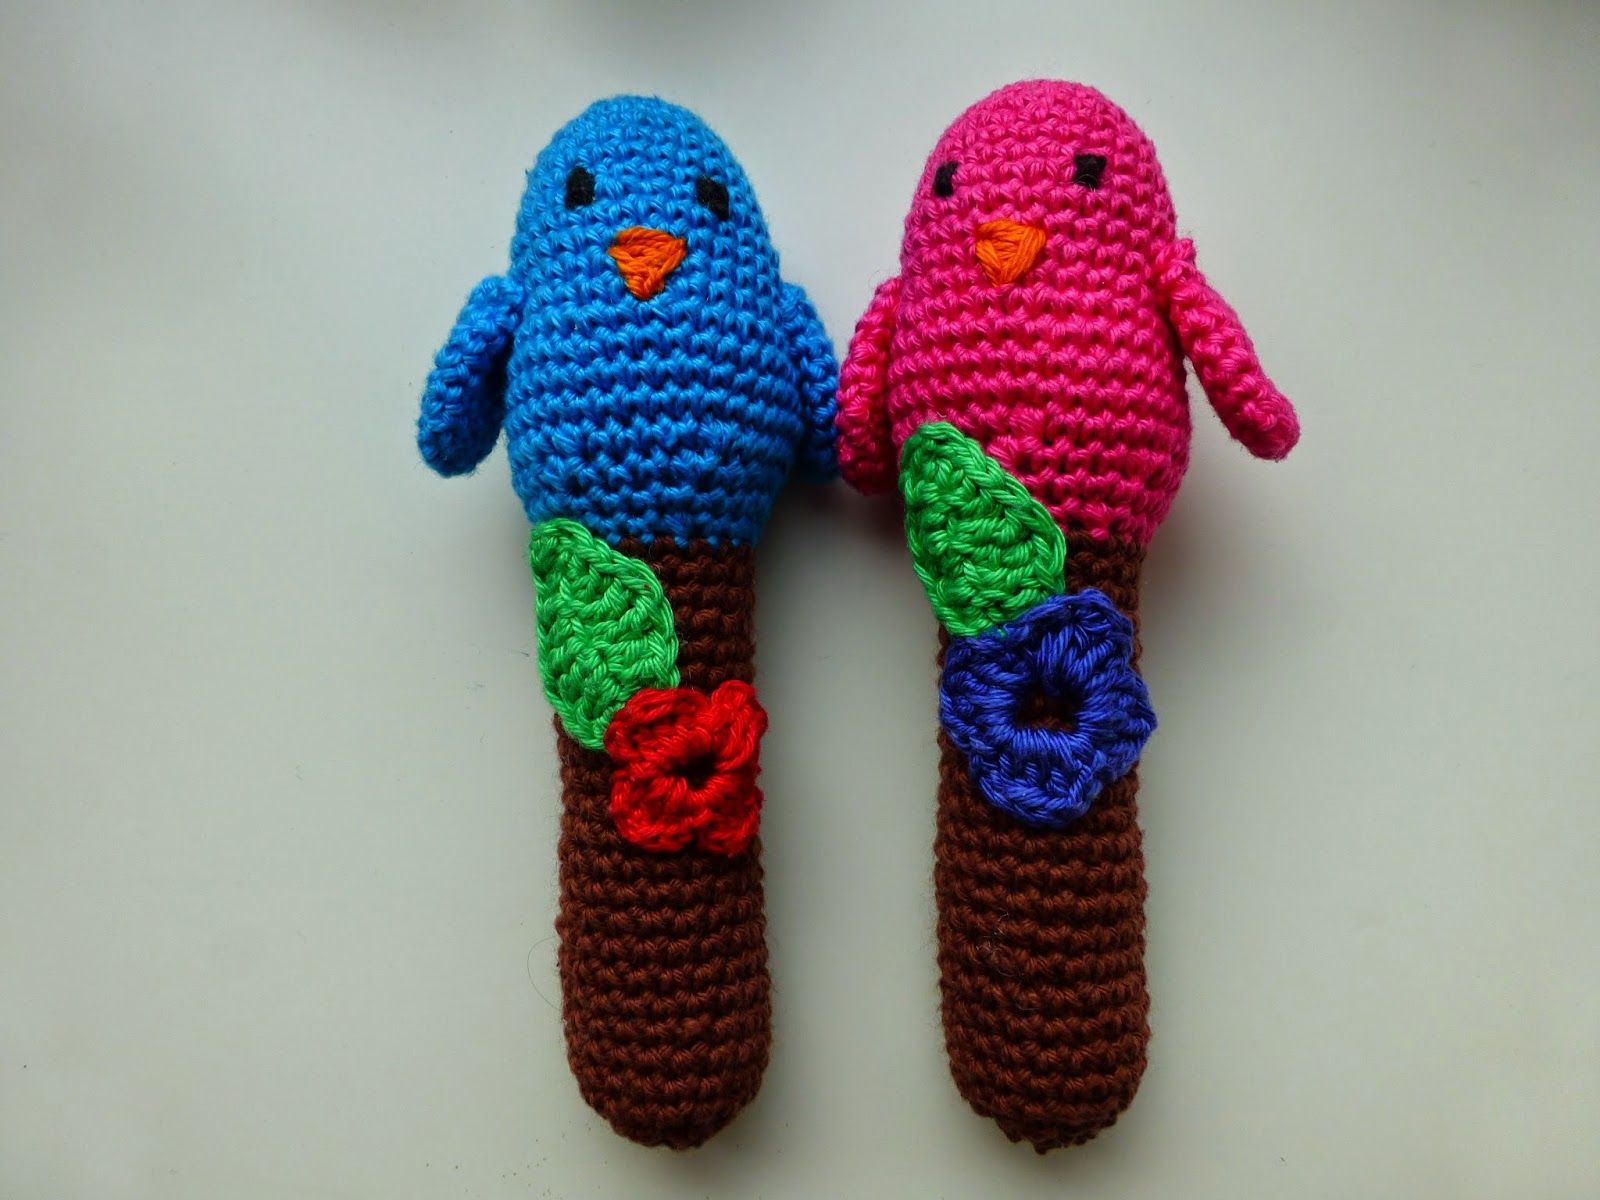 Free crochet pattern for baby rattles   crochet gifts   Pinterest ...